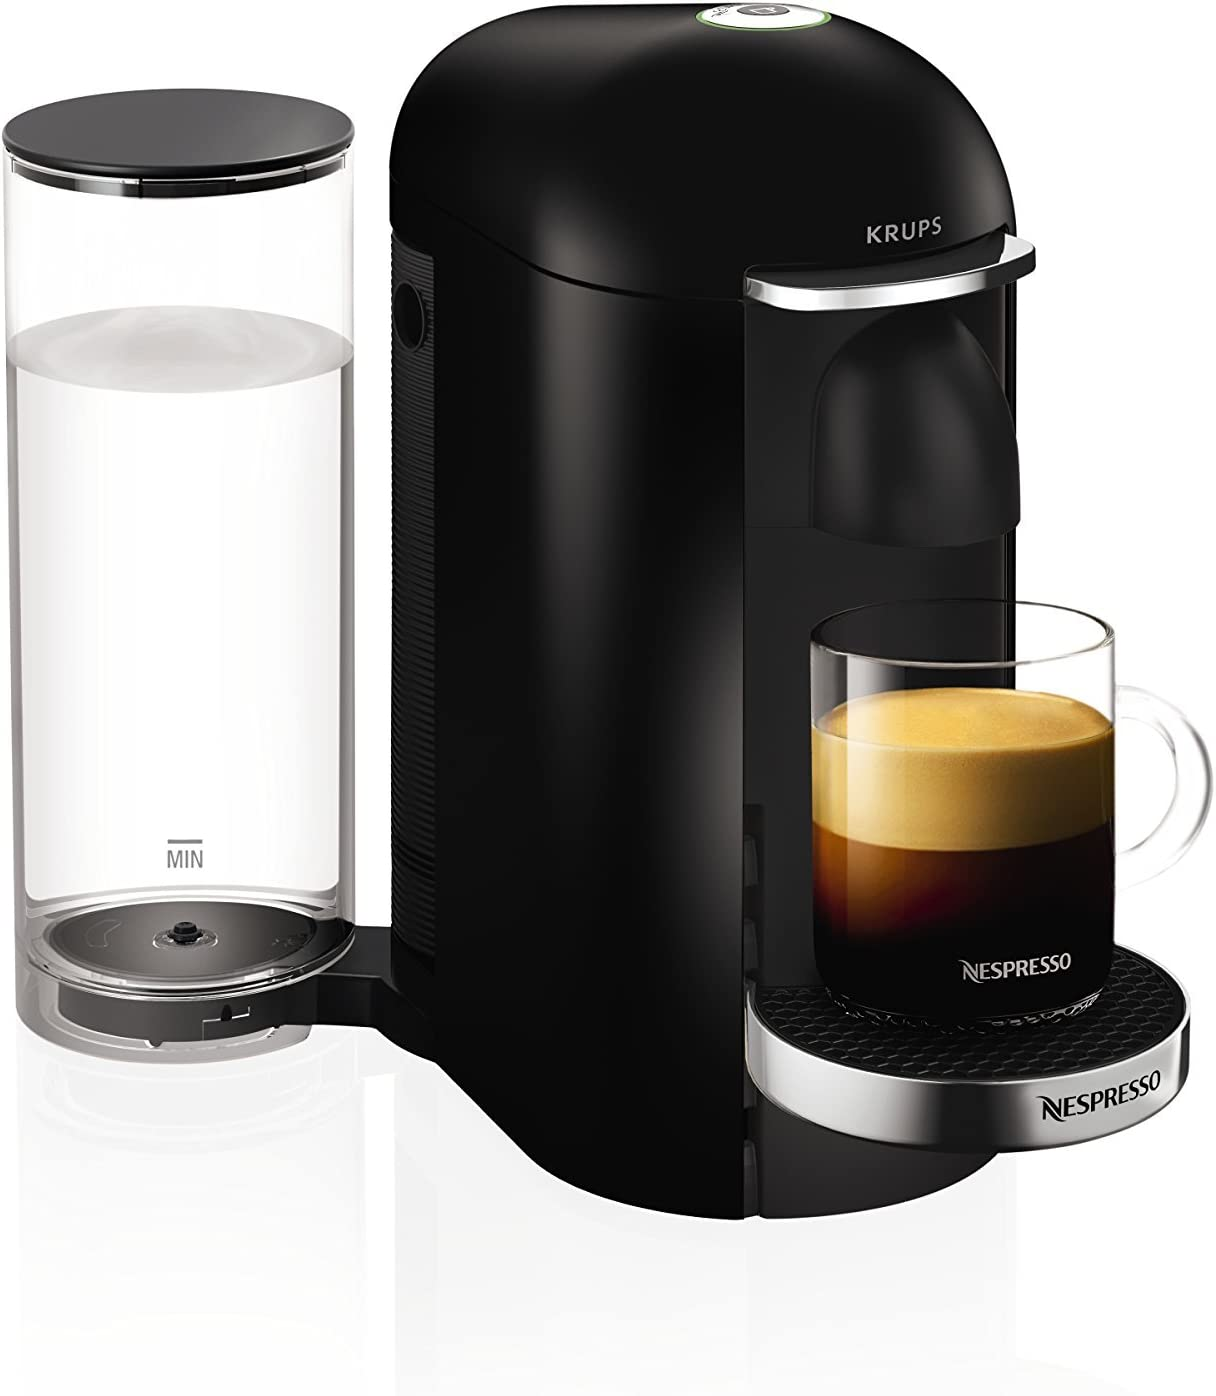 Nespresso Vertuo Plus Black Finish By Krups Renewed